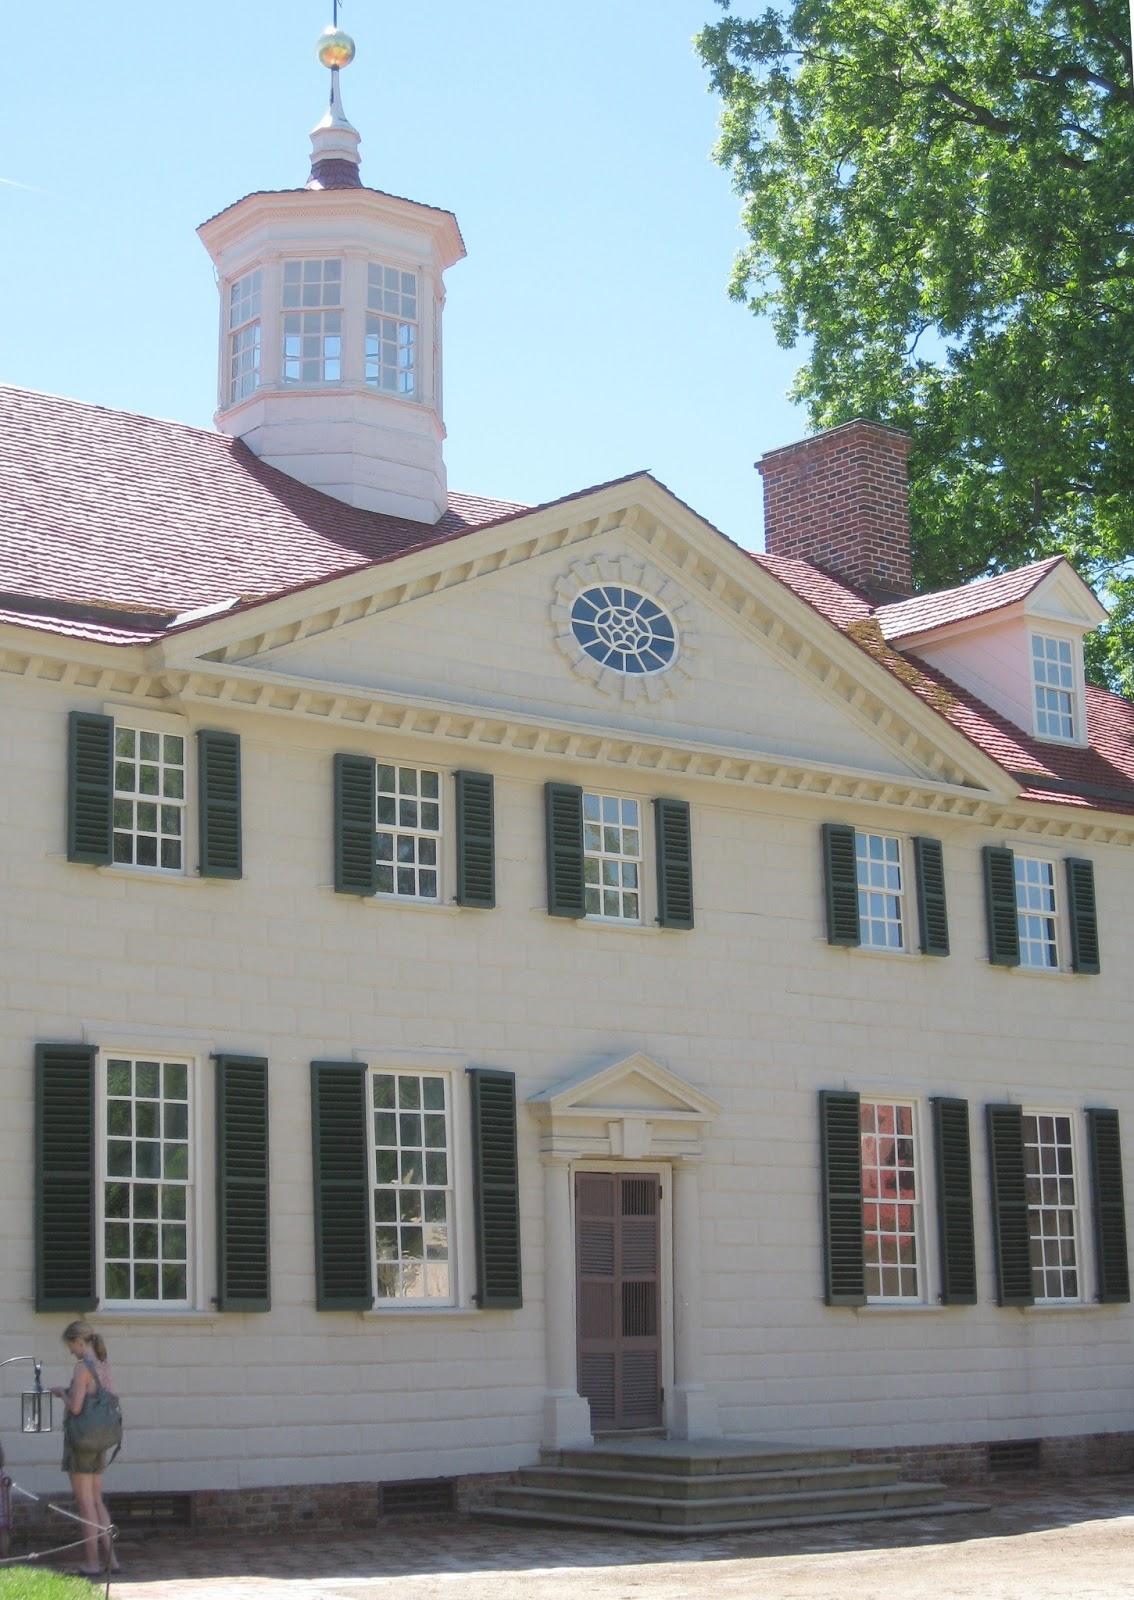 Mount Vernon home of George Washington in Virginia